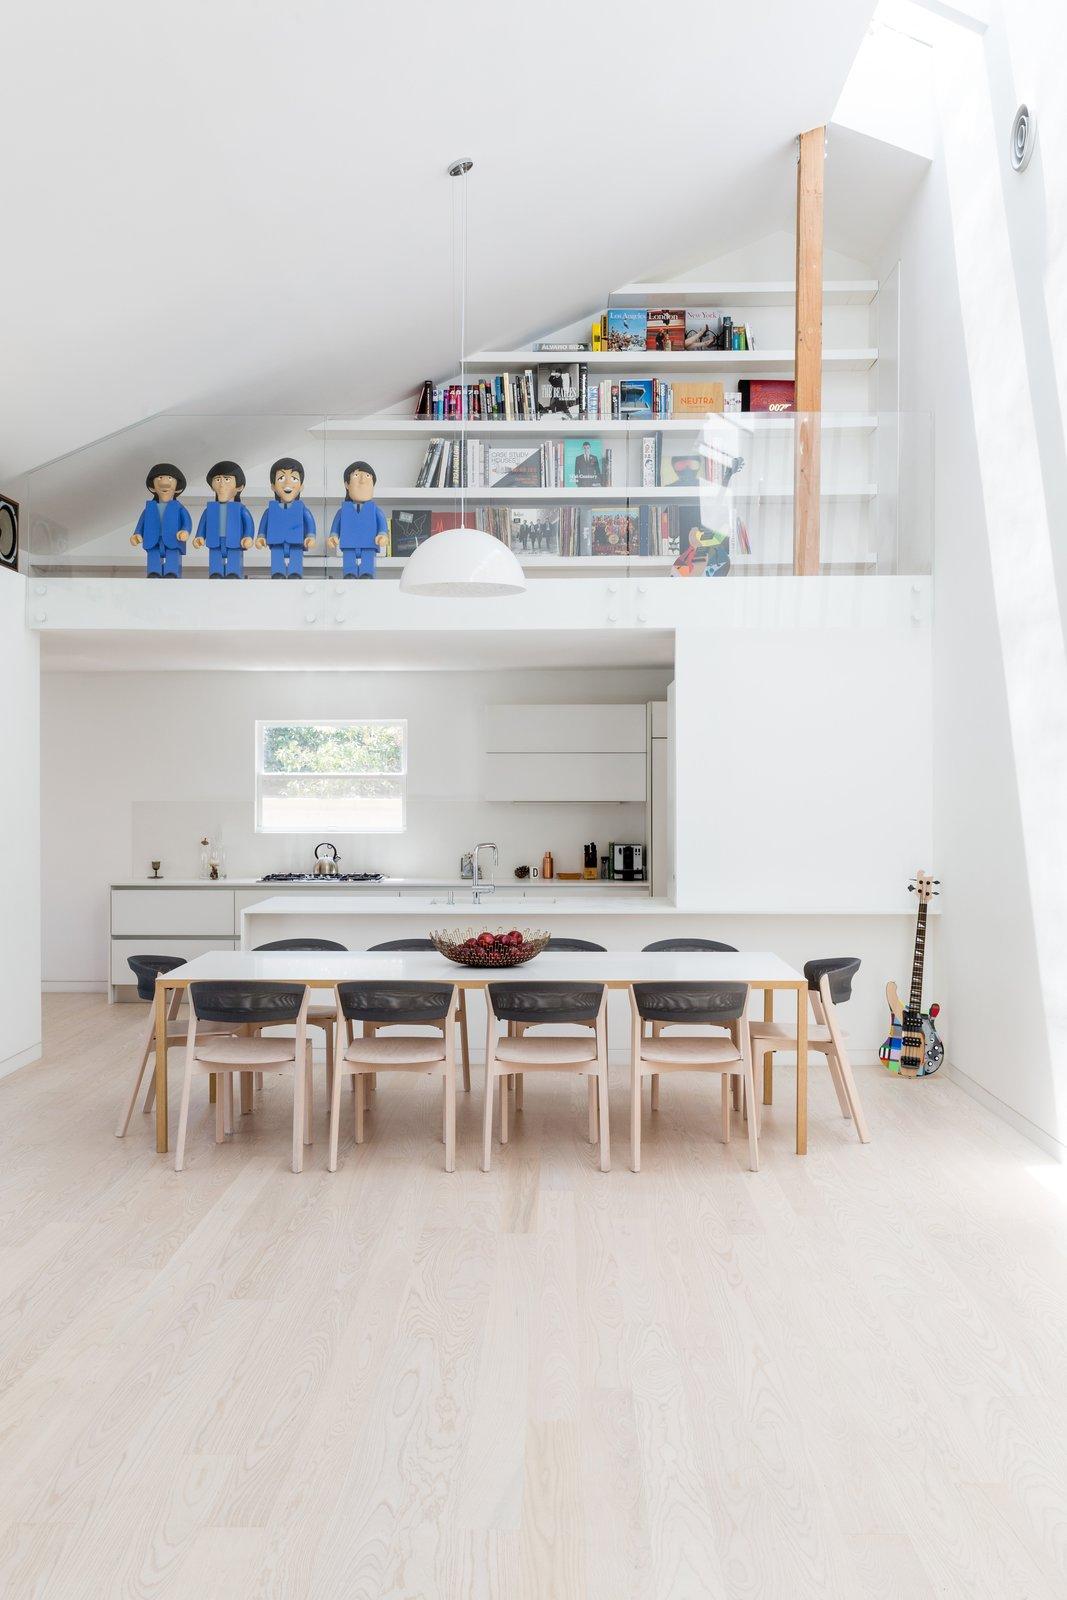 #danbrunn #no9dream #residence #losangeles #california #diningroom #interior #table #chairs #renovation  No. 9 Dream Residence